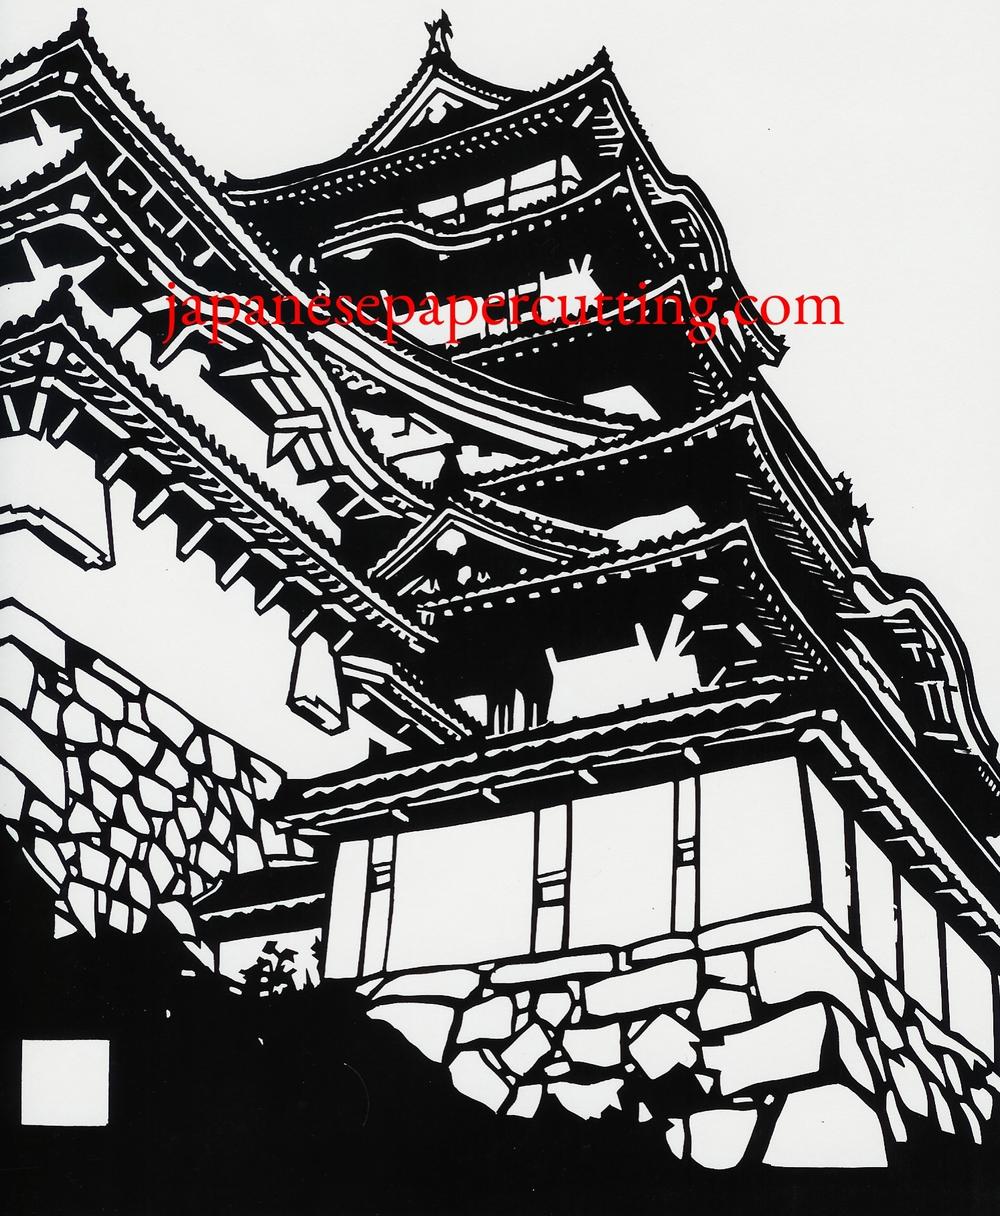 Himeji Castle | Himeji, Hyogo, Japan | 2005